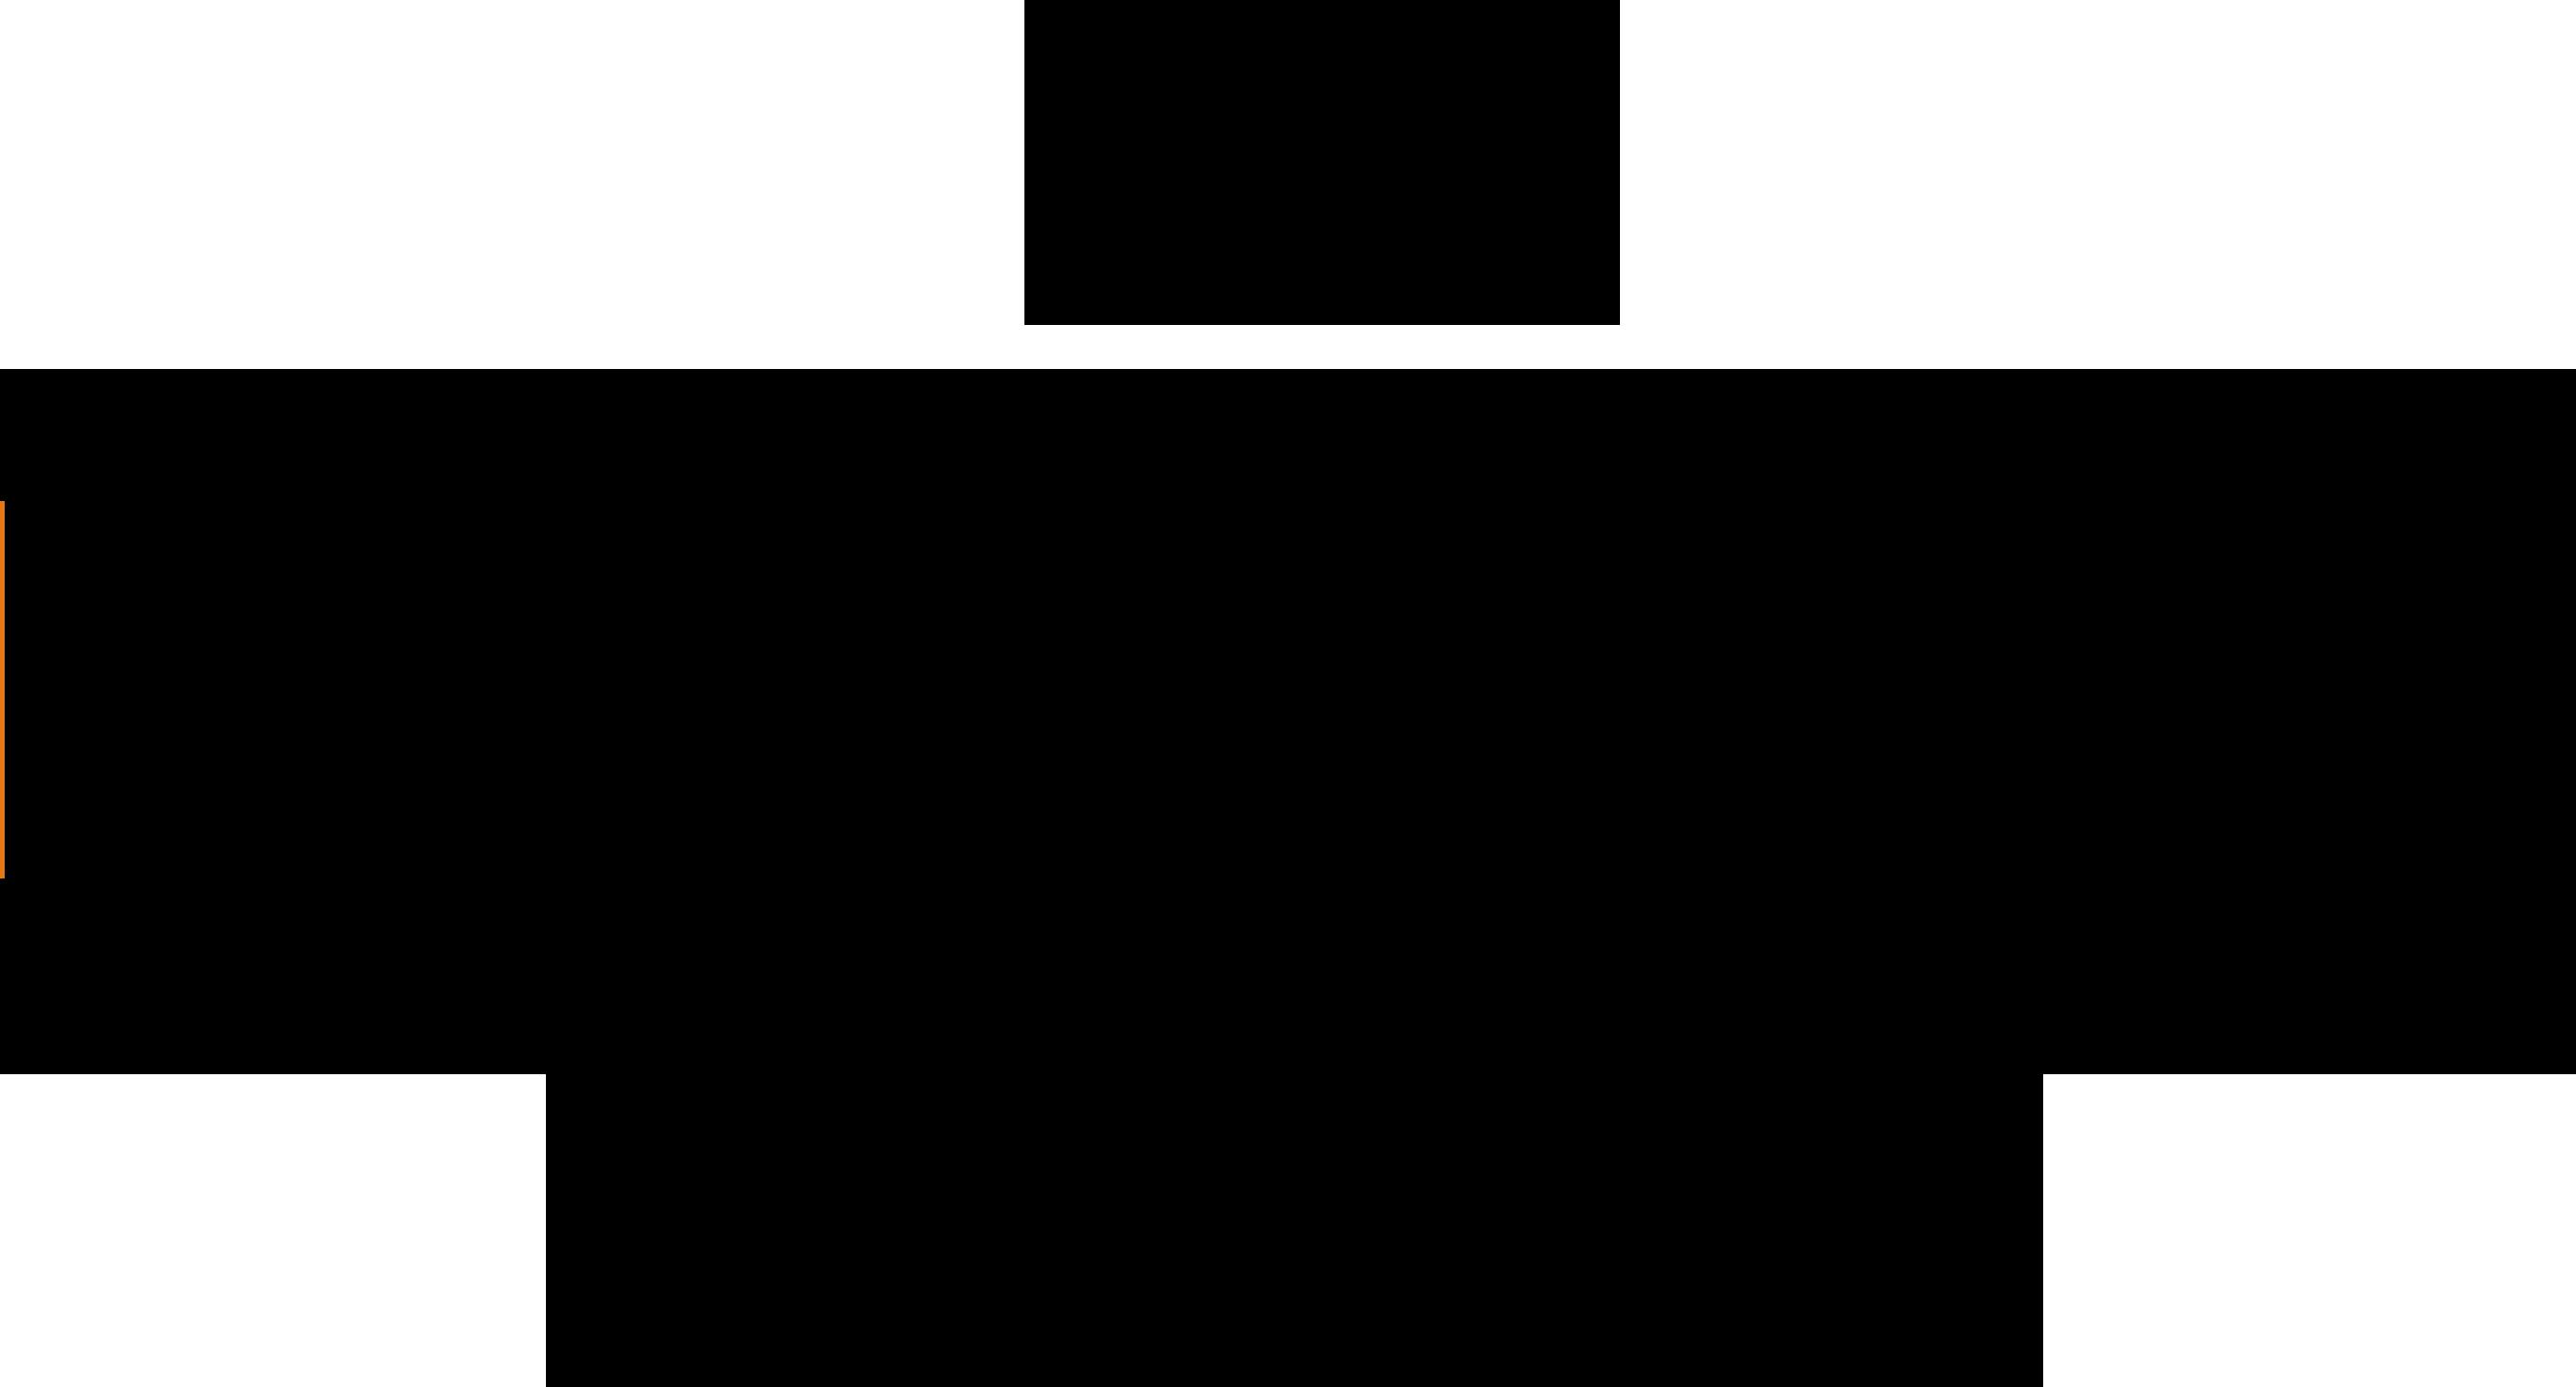 The_Walt_Disney_company_logo